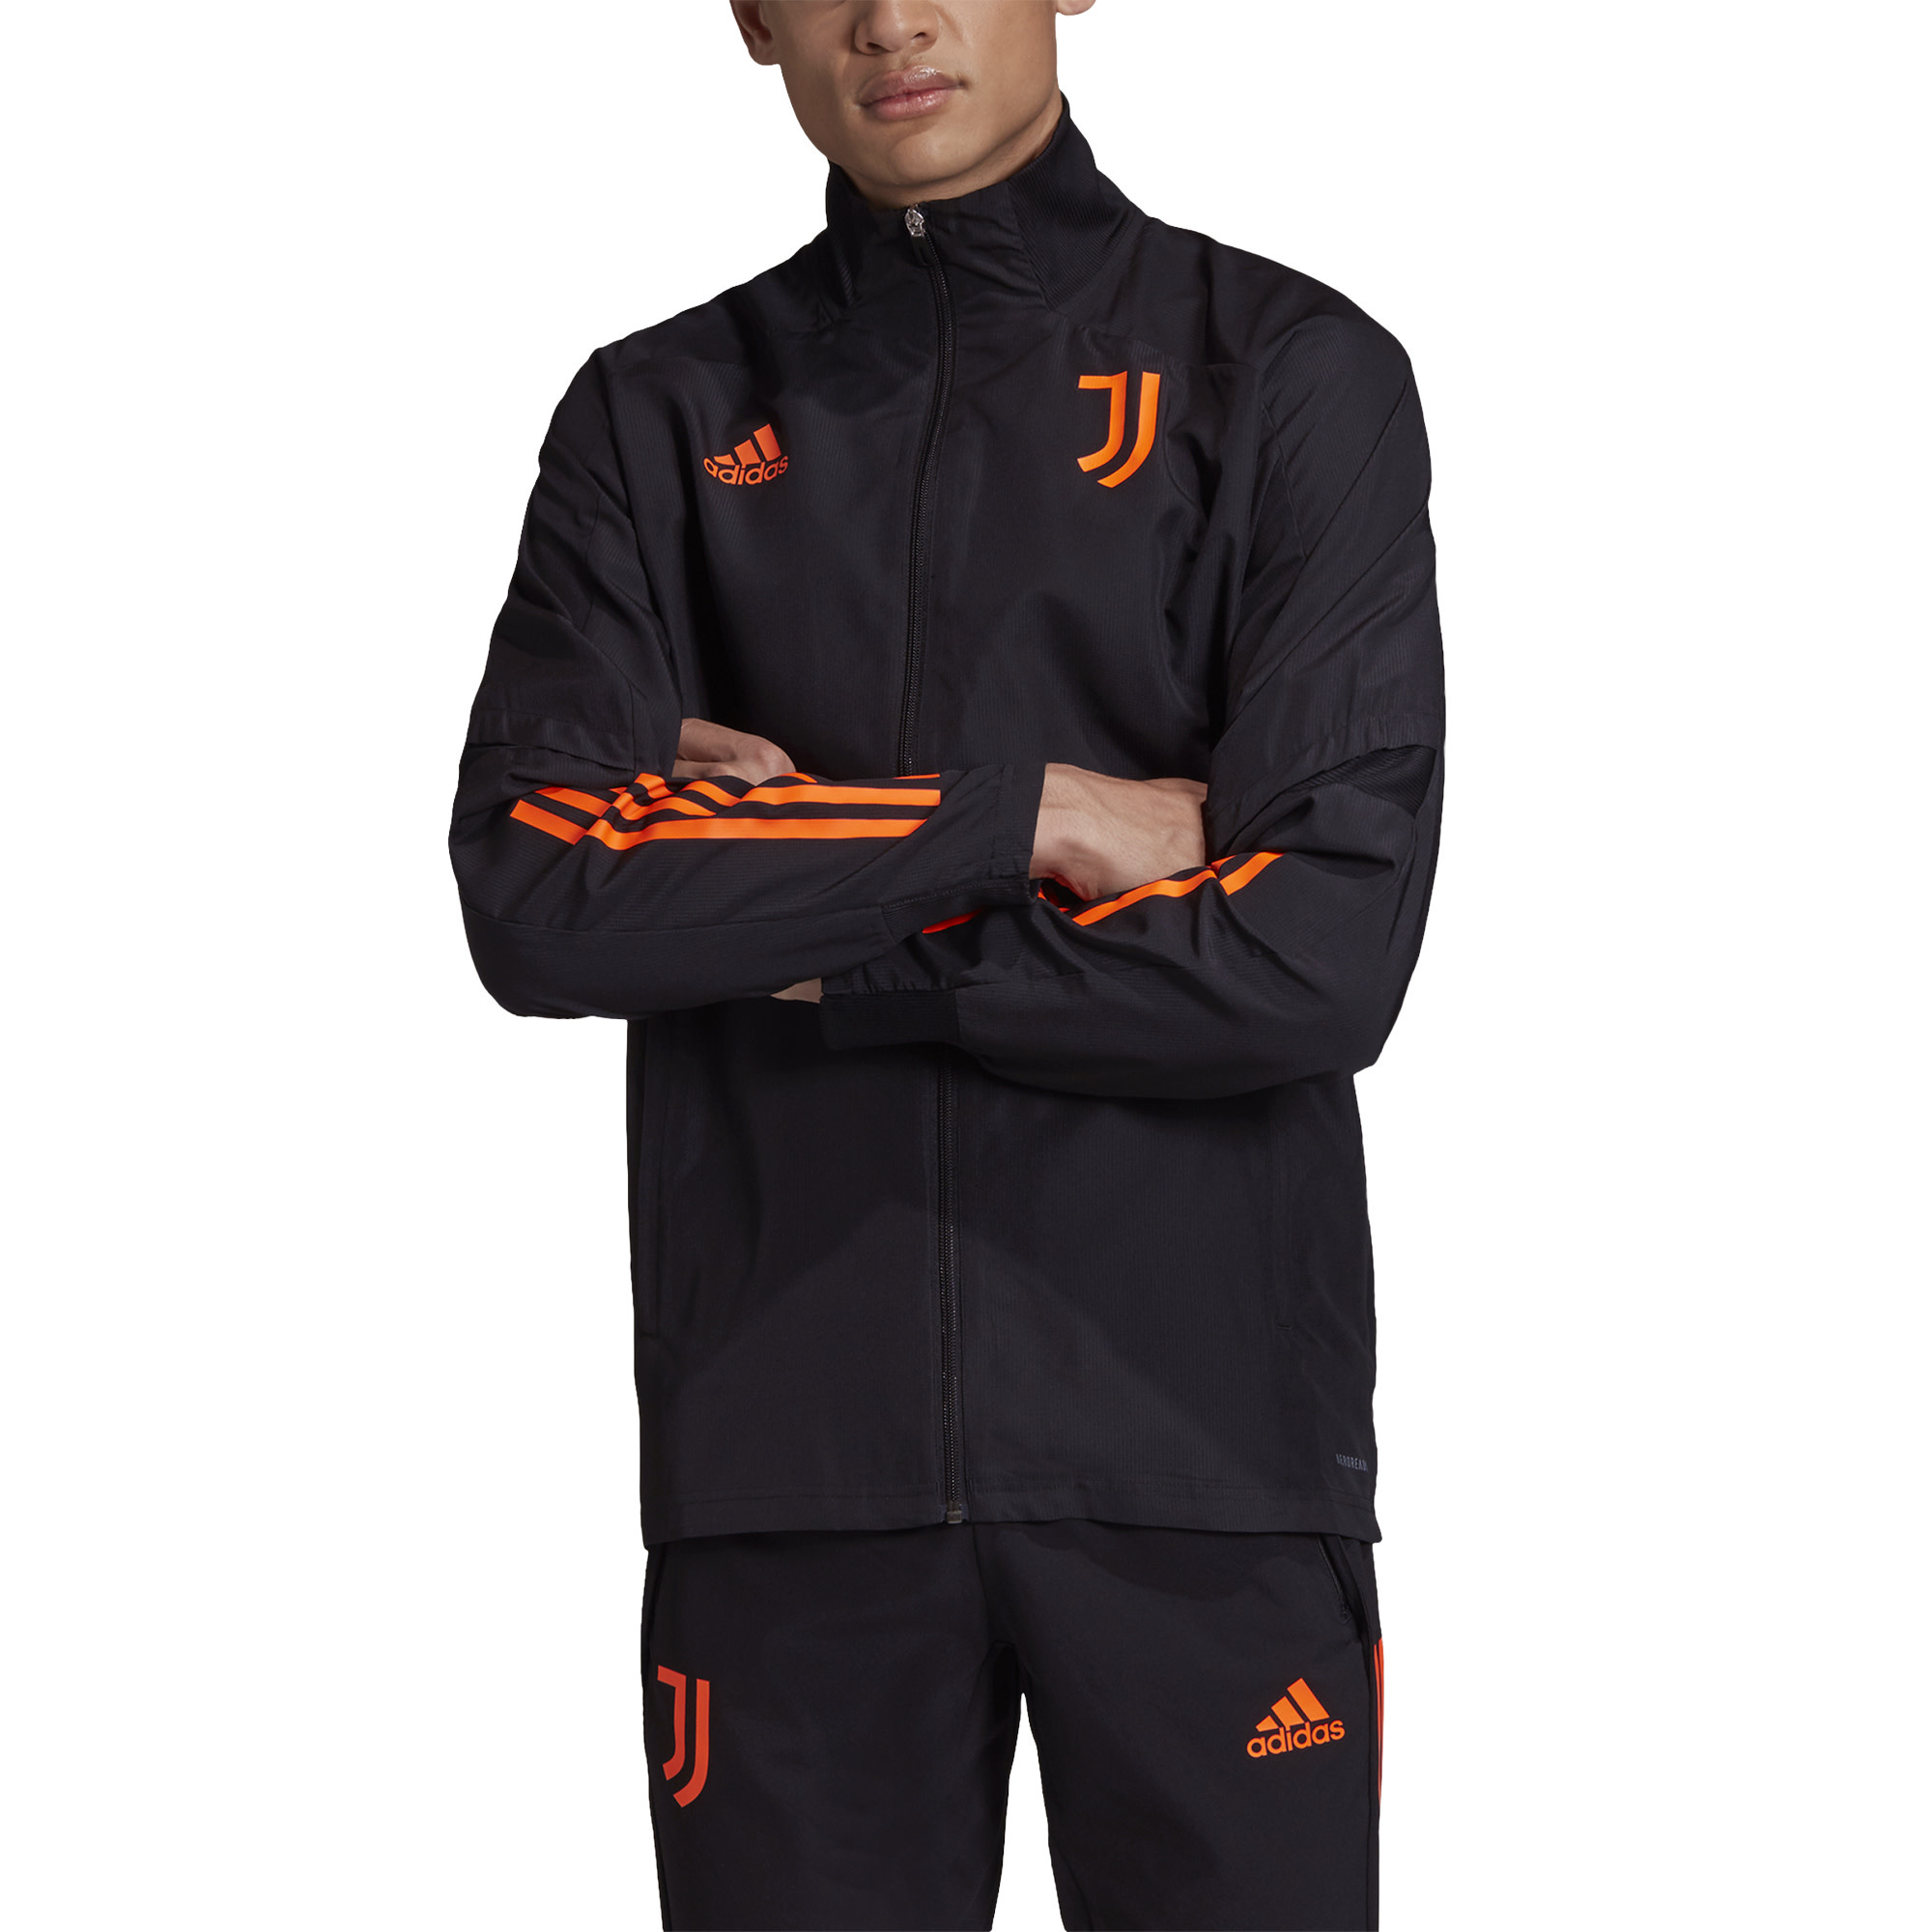 Adidas ADIDAS Juventus EU PRES Suit '20-'21